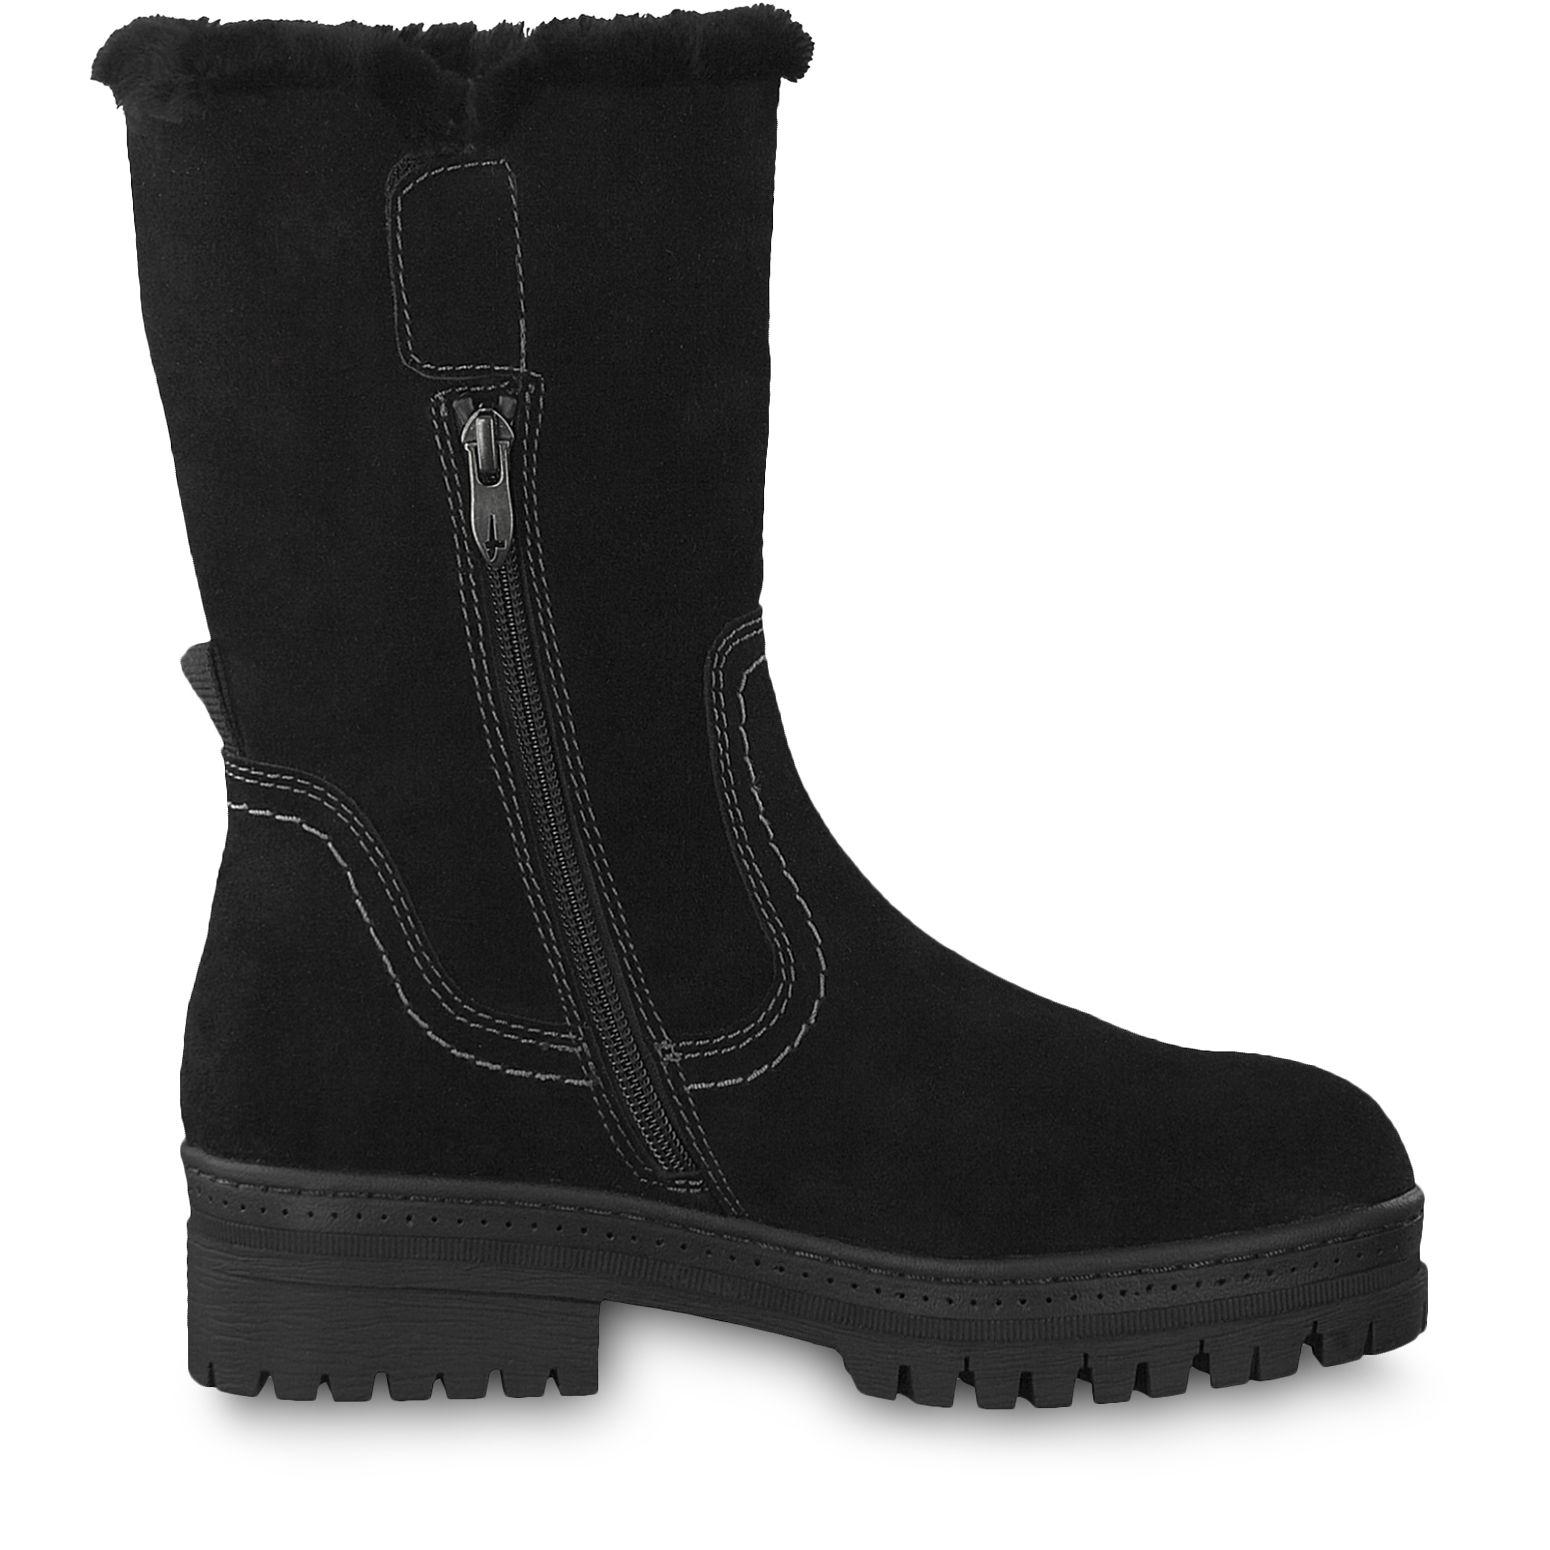 Brience 1-1-26468-21  Buy Tamaris Booties online! 73db7805e6